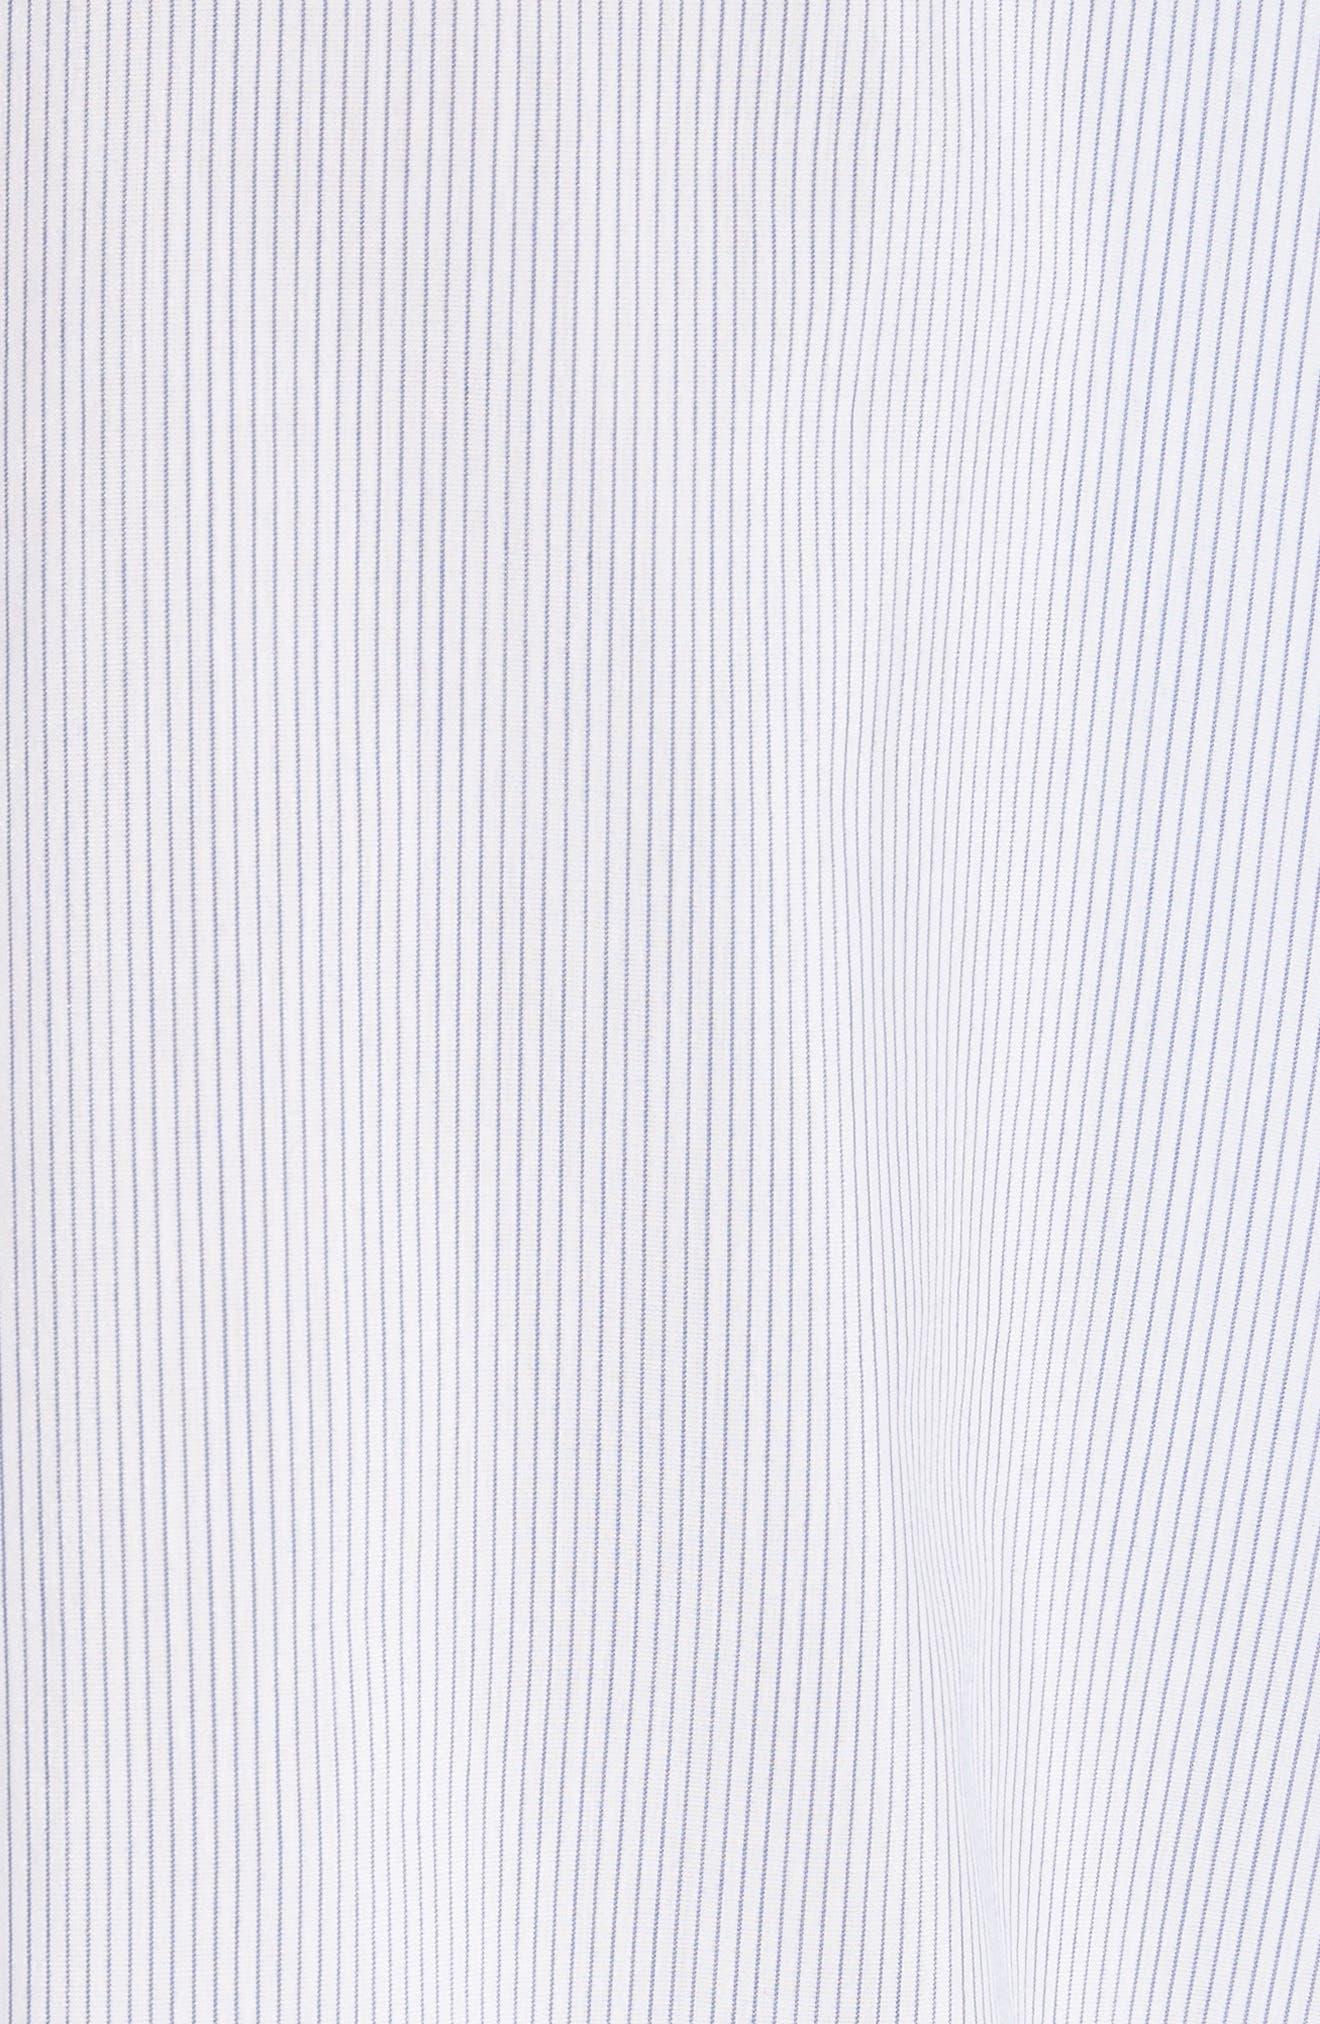 Breezy Stripe Saige Blouse,                             Alternate thumbnail 6, color,                             White Multi